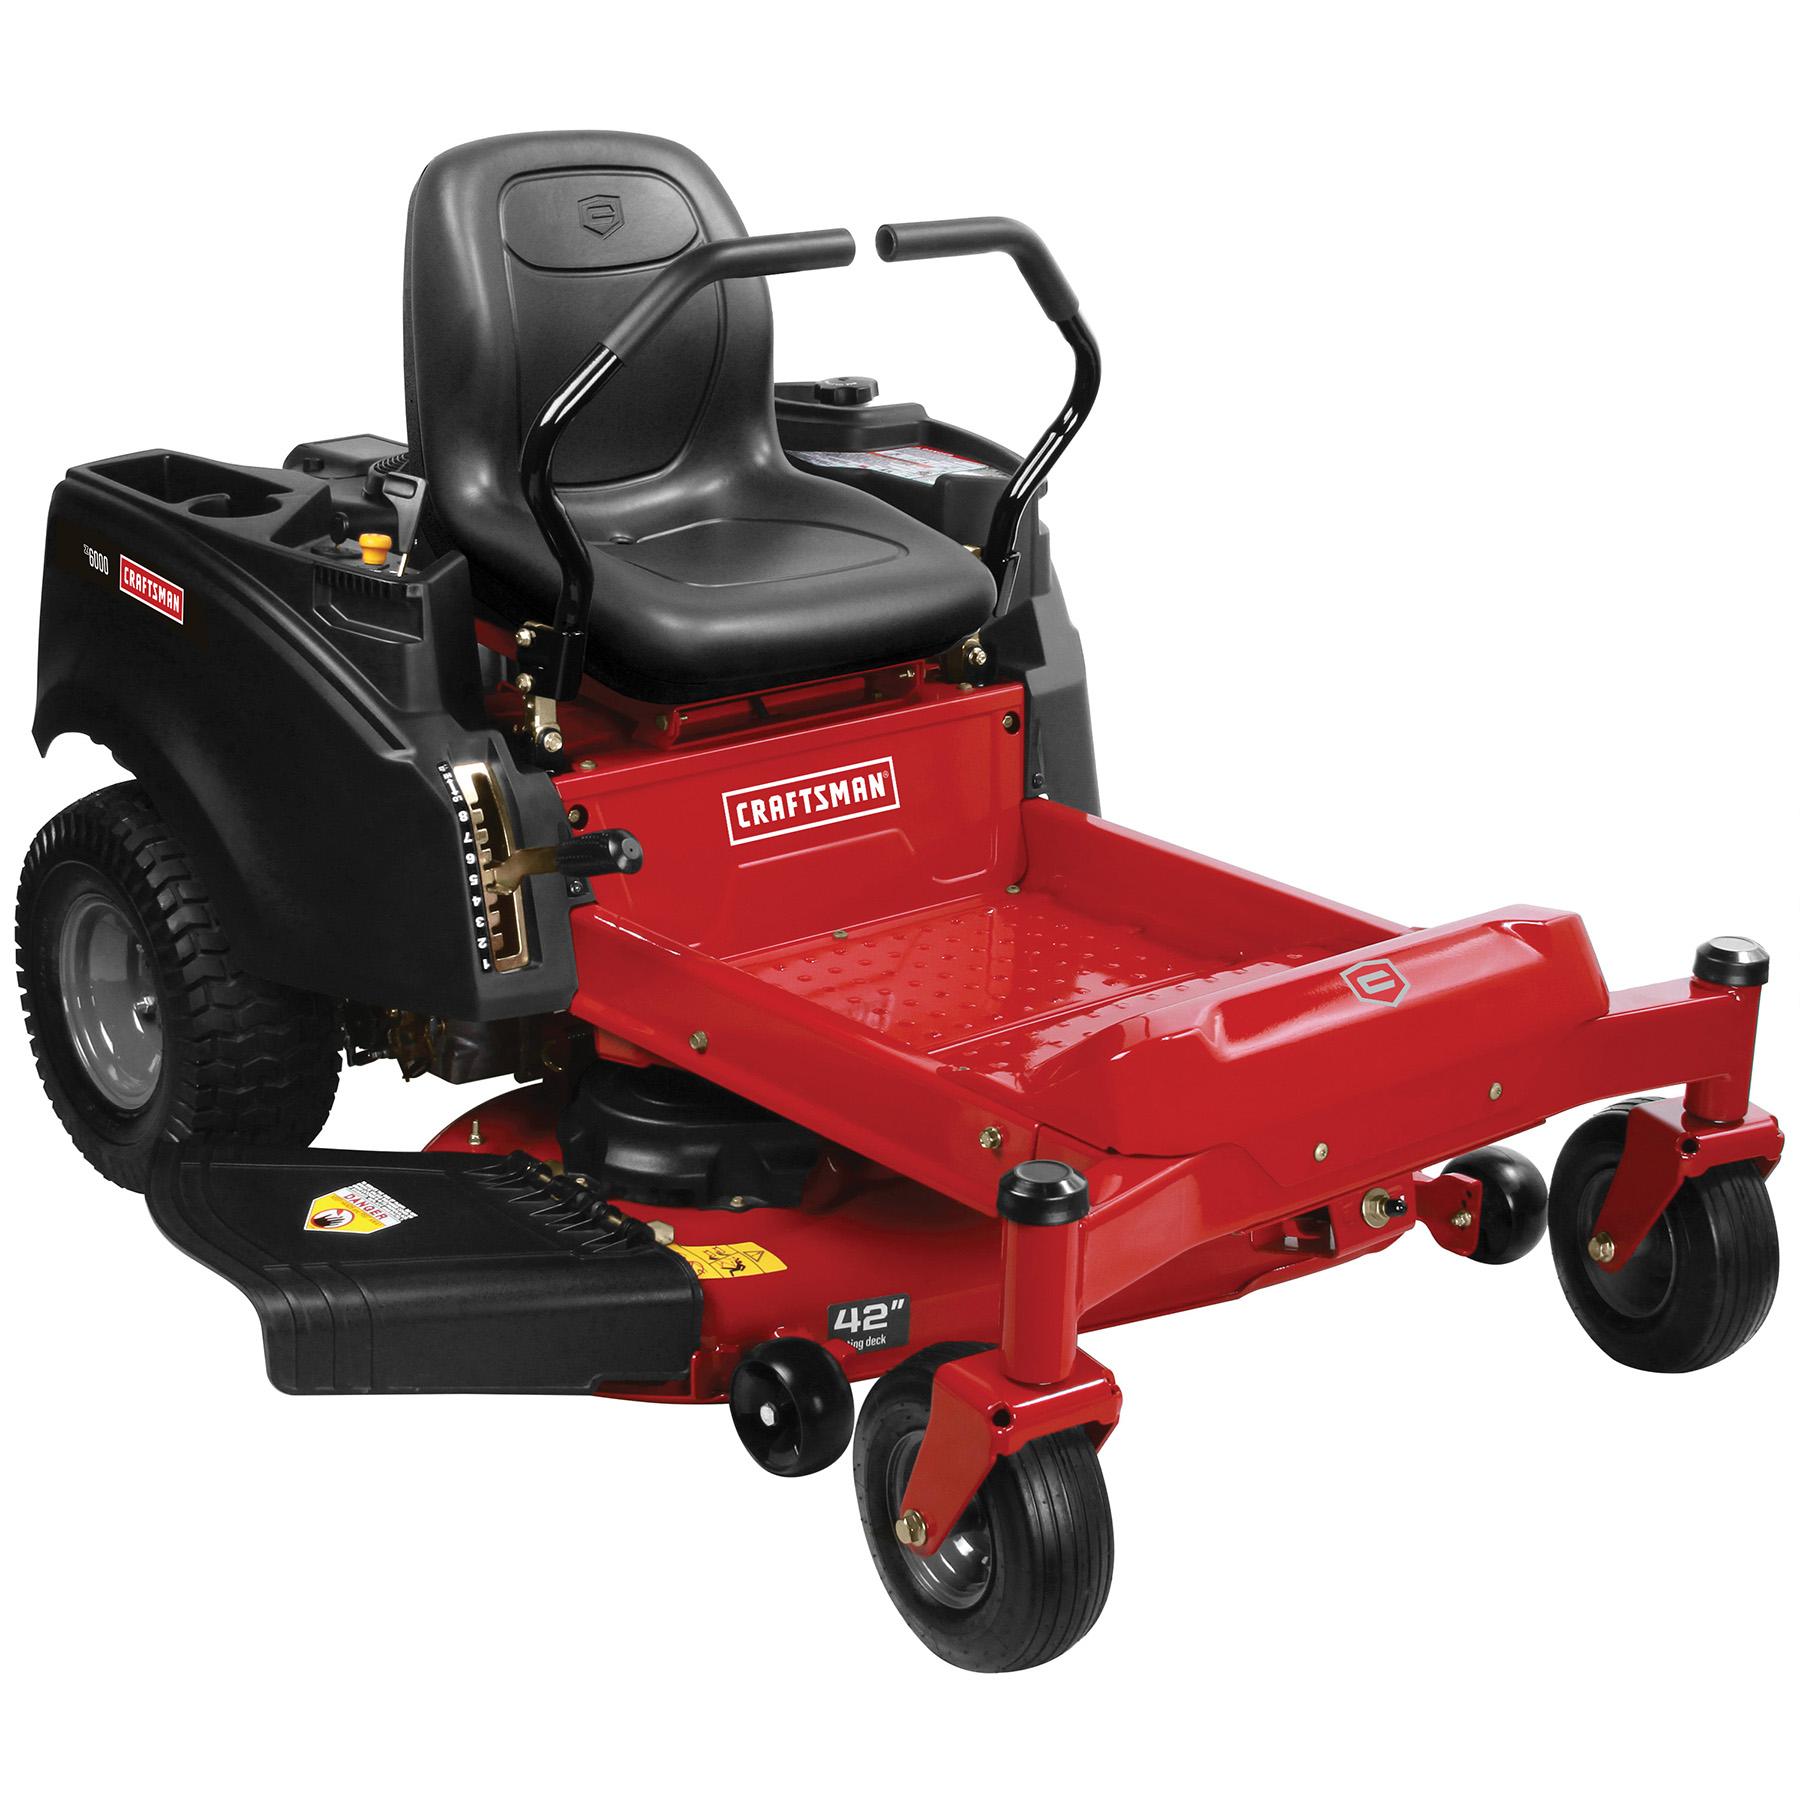 medium resolution of craftsman 20411 42 22 hp v twin briggs stratton zero turn riding mower